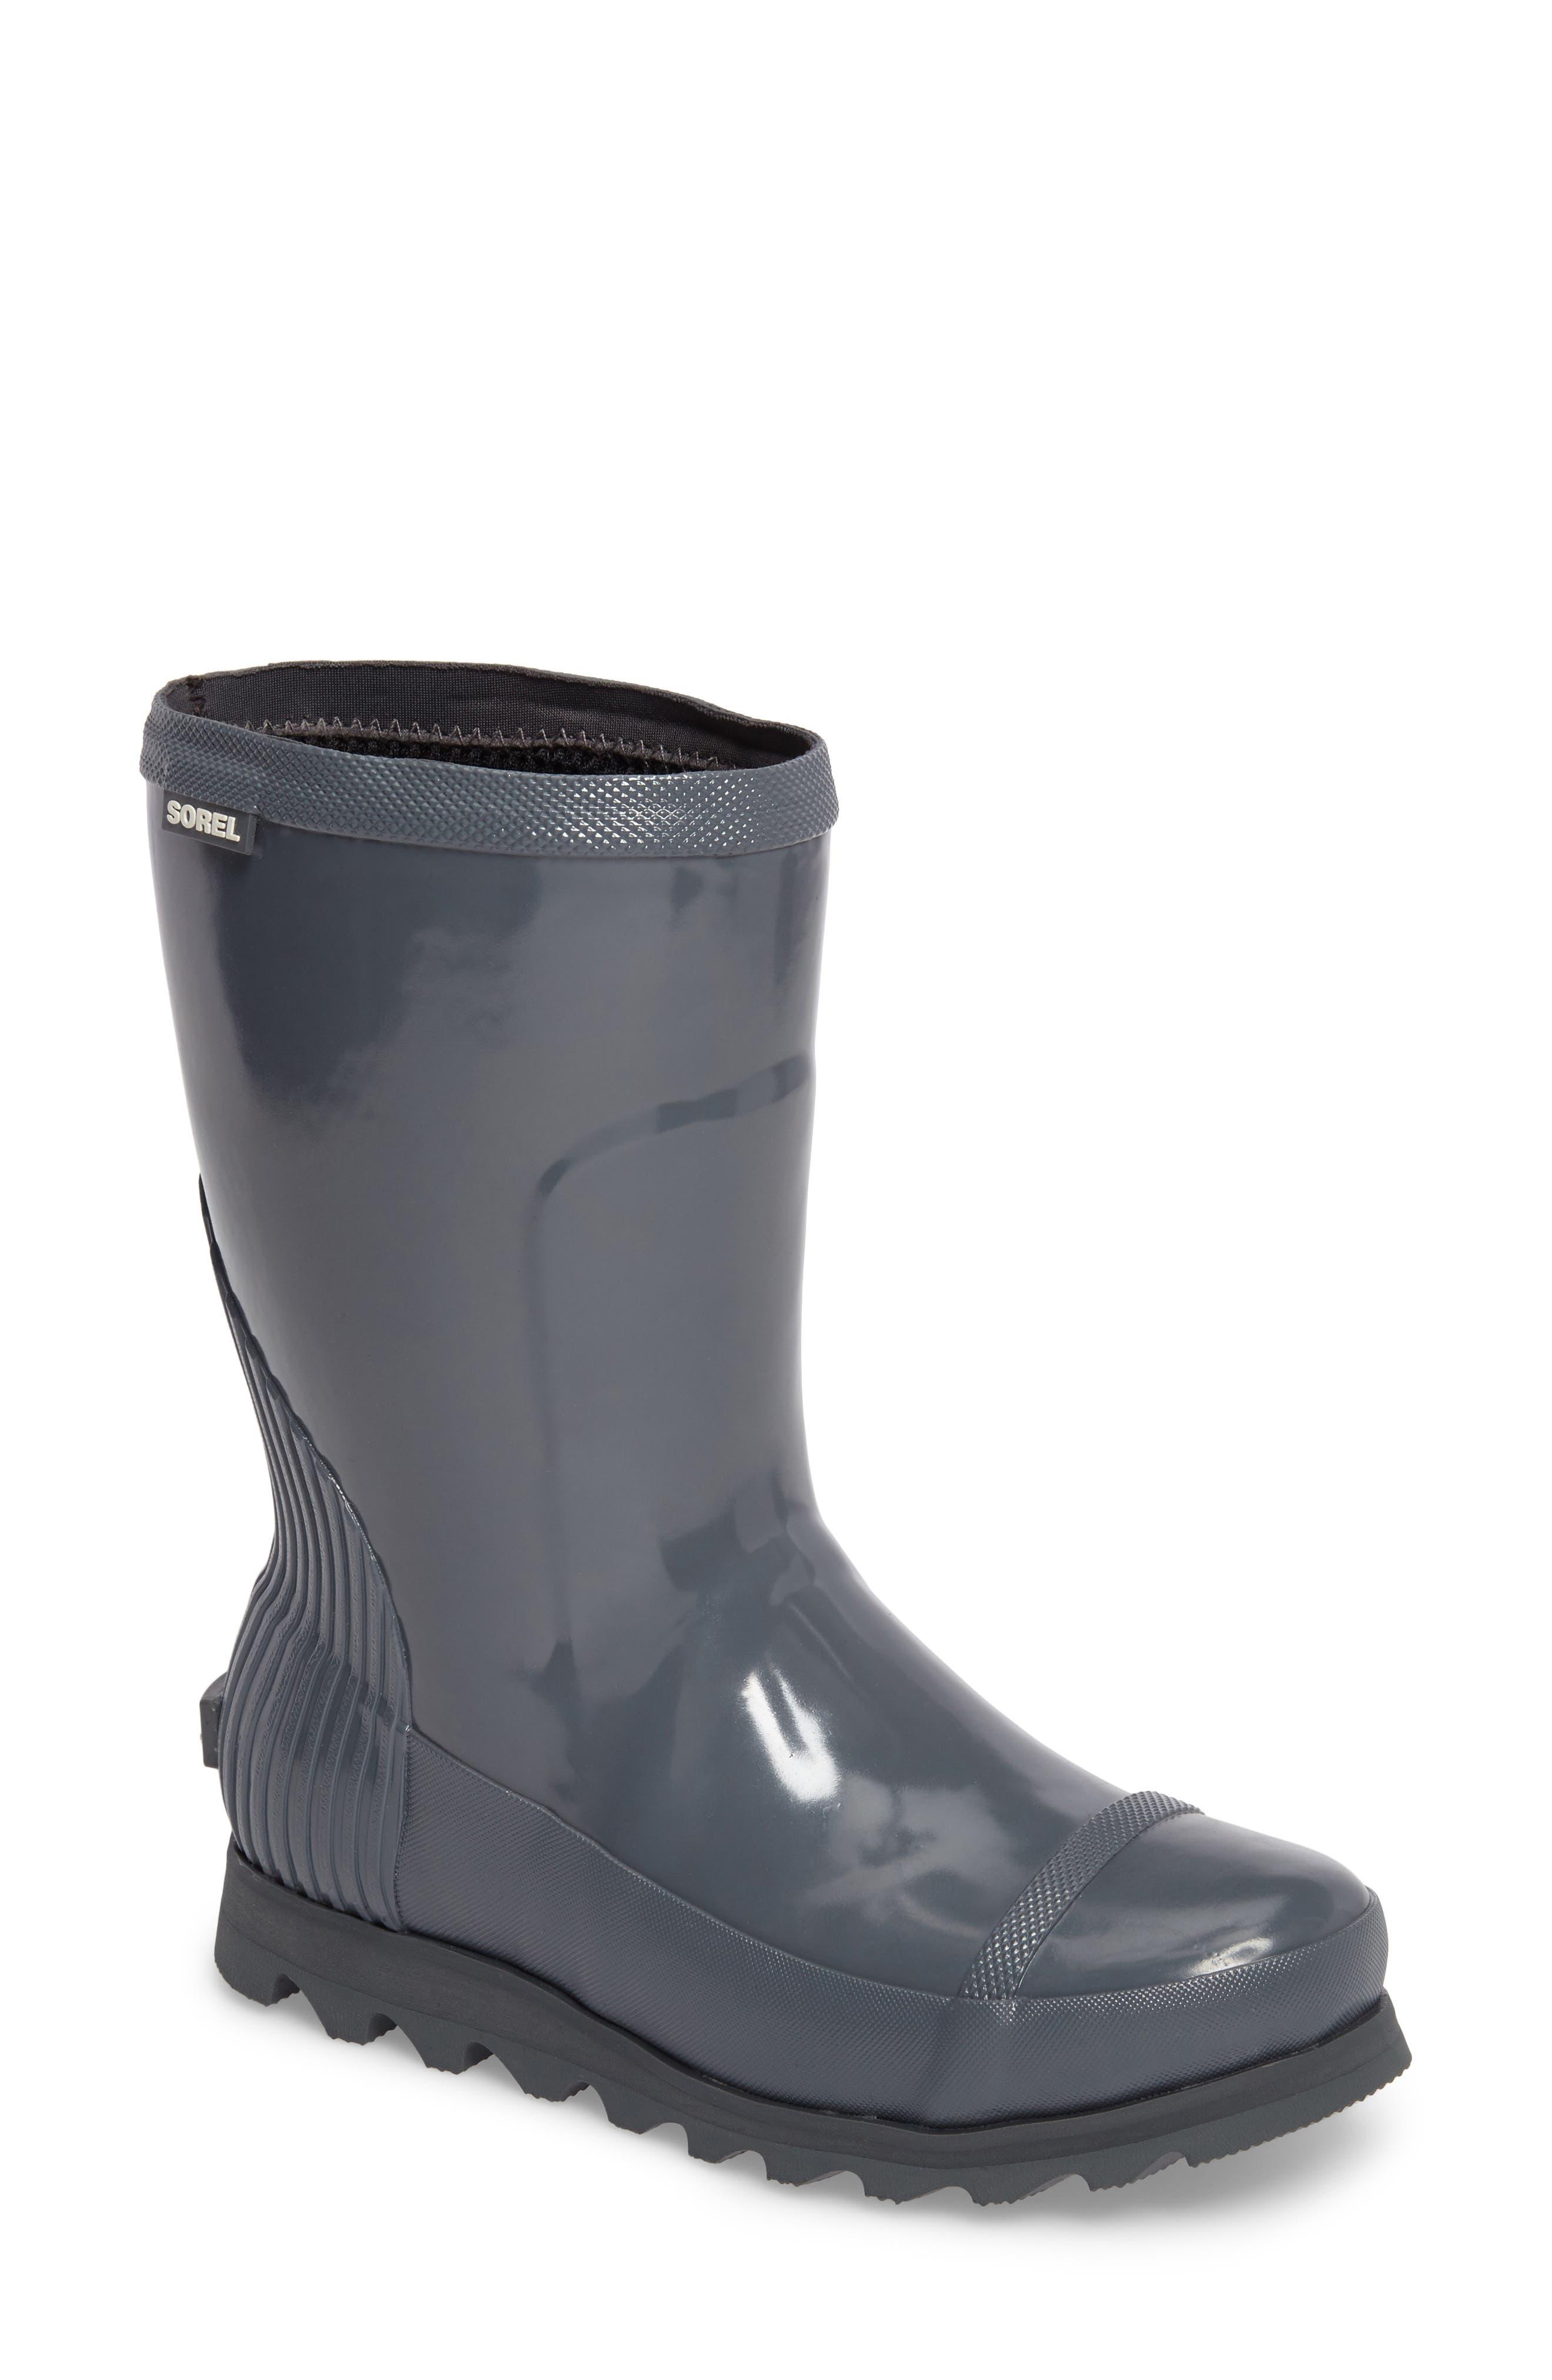 Joan Glossy Short Rain Boot,                         Main,                         color, GRAPHITE/ SEA SALT